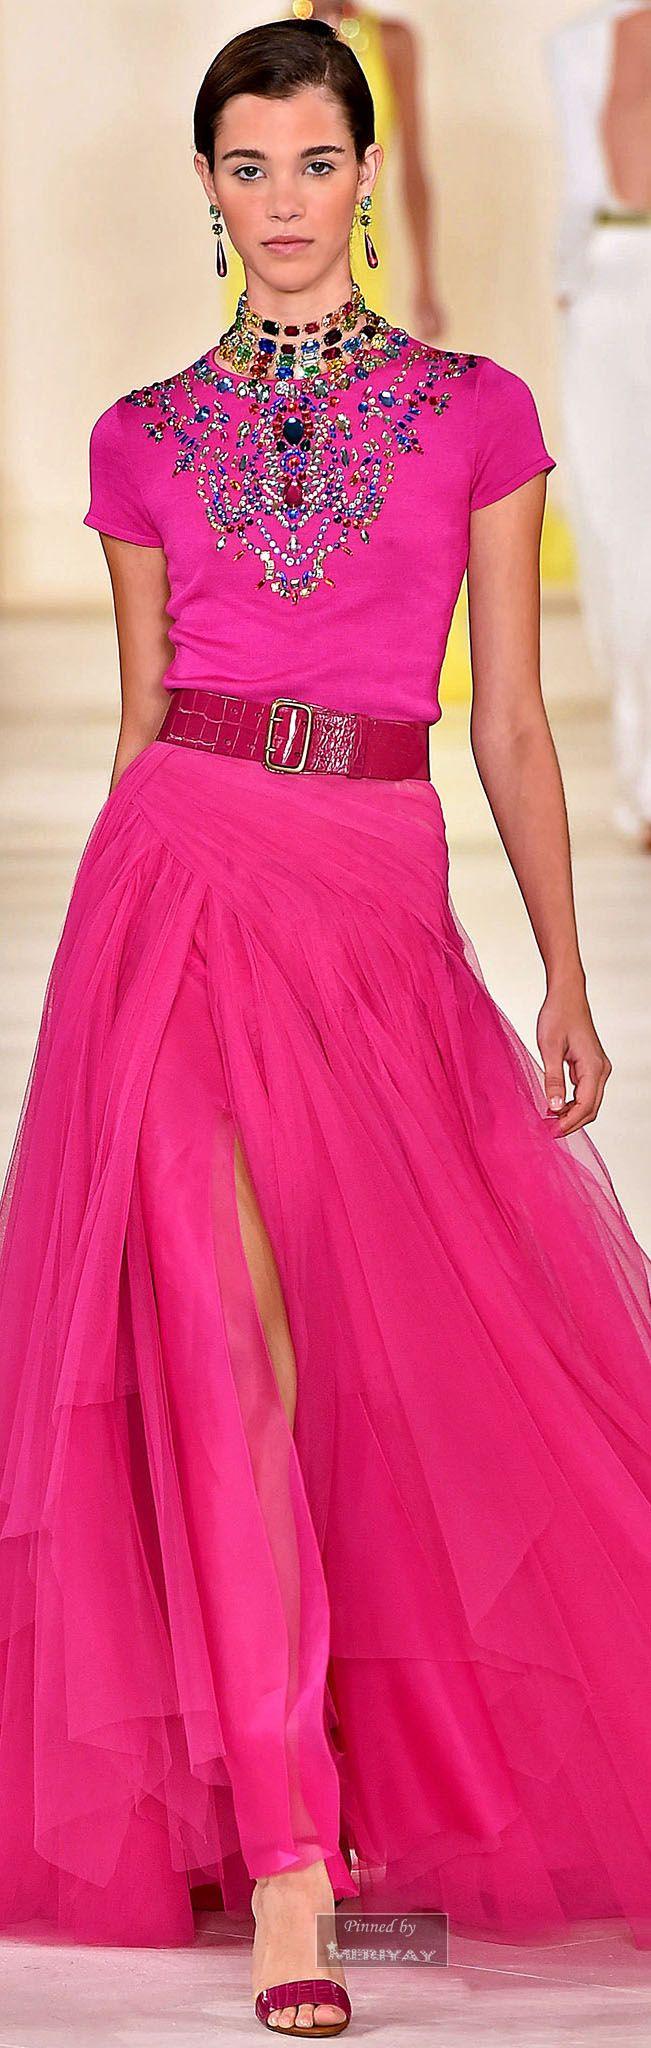 Ralph Lauren.Spring 2015. BongoJazz.co.uk | Dress | Pinterest ...